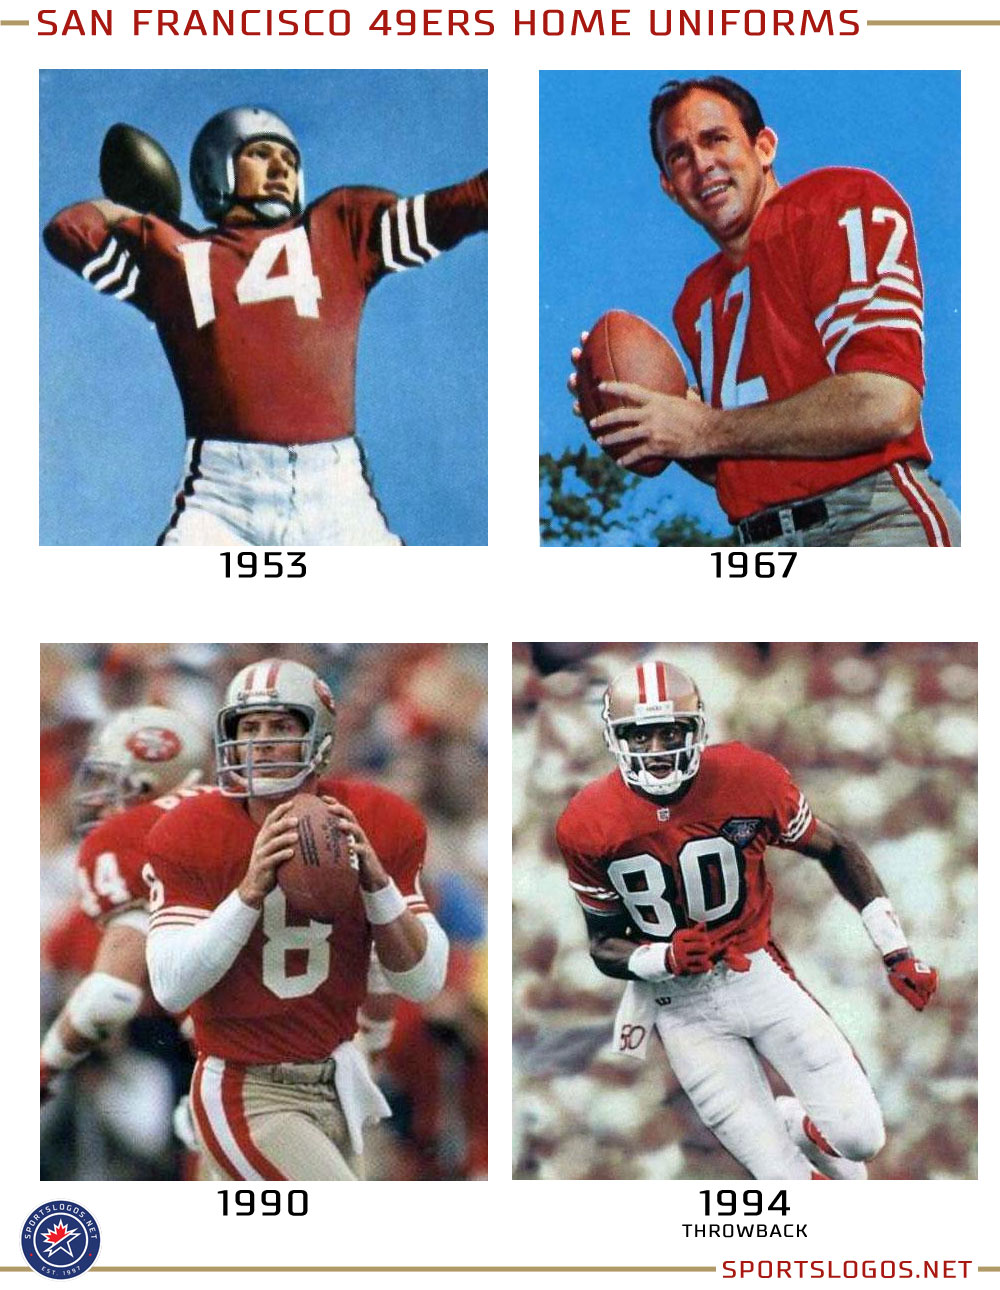 sale retailer 2b961 87428 Some San Francisco 49ers Home Uniforms | Chris Creamer's ...